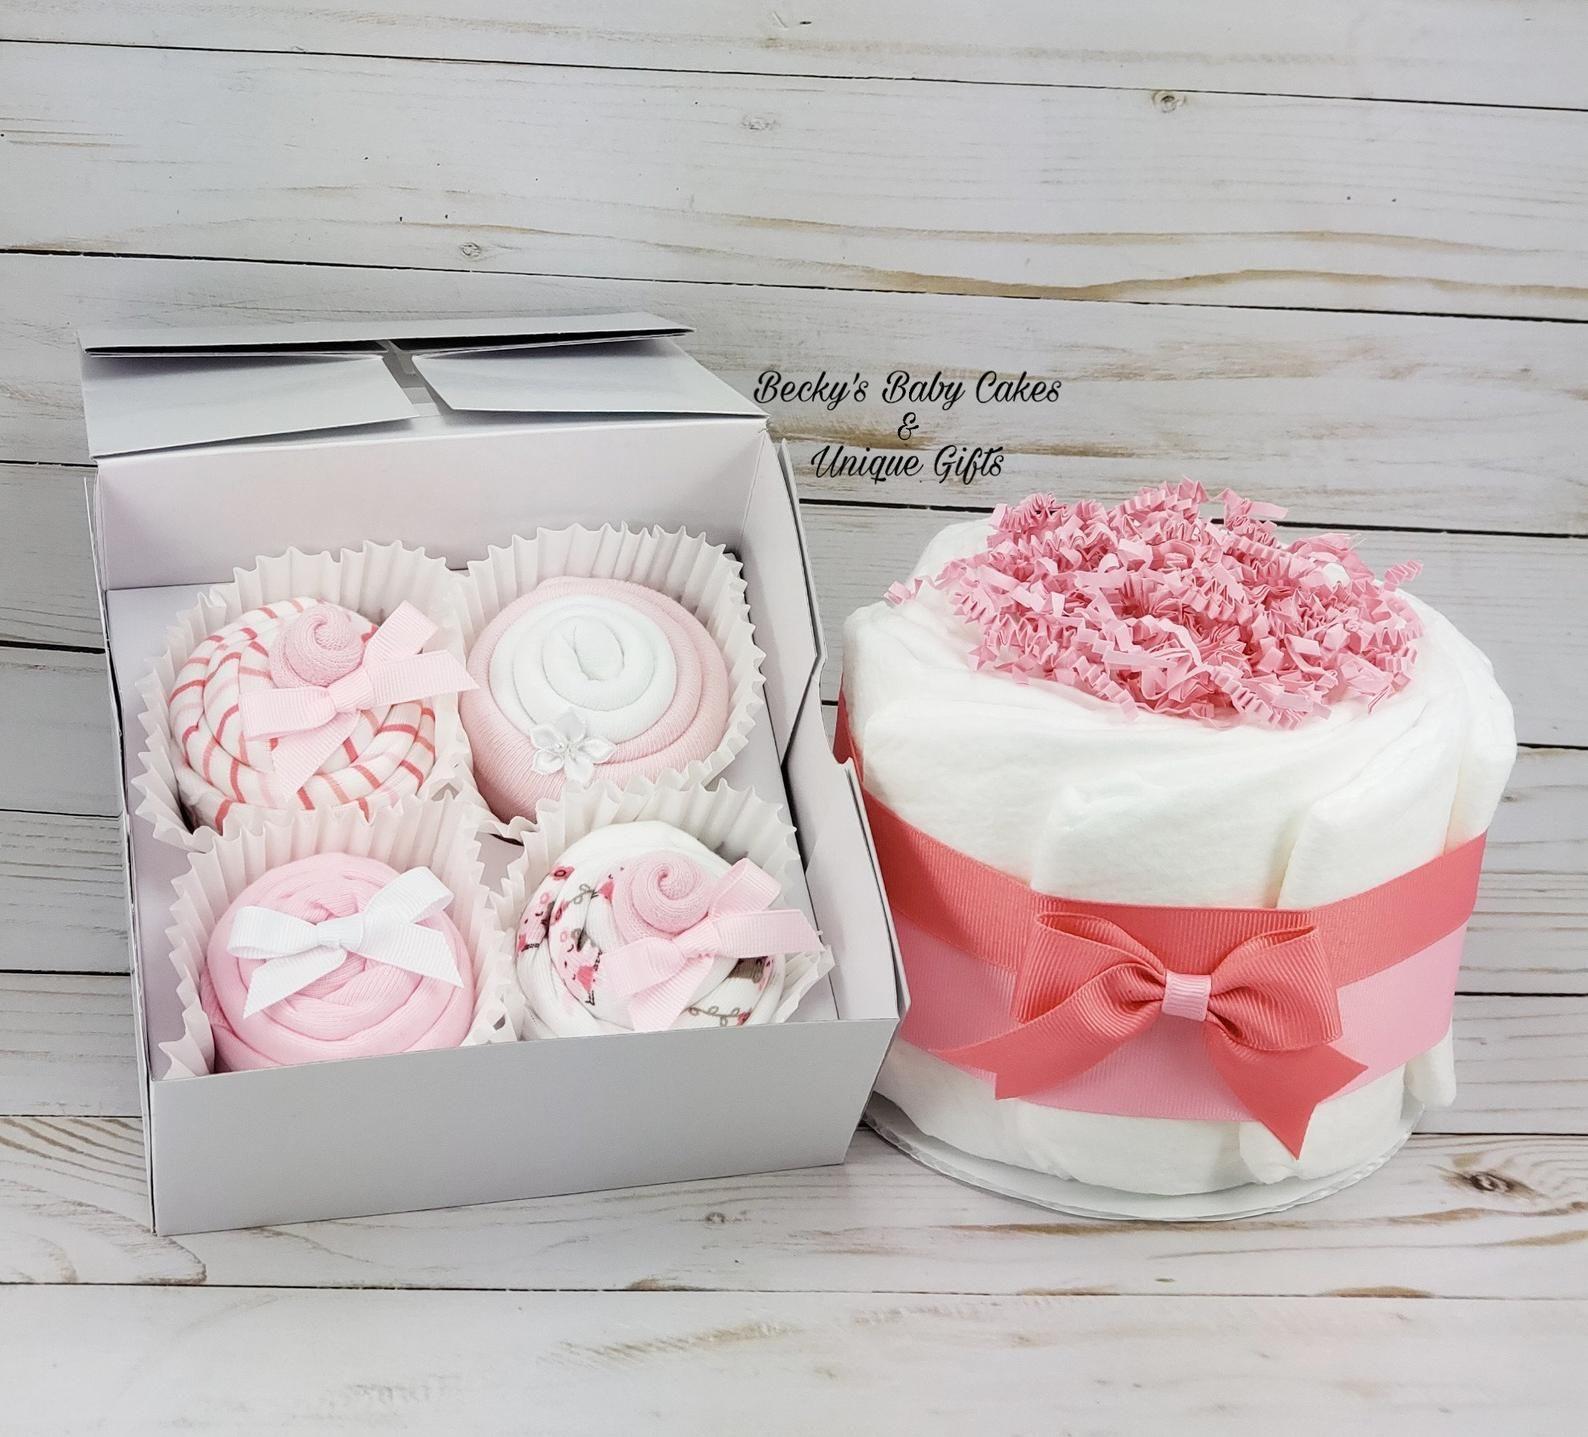 137baac2b2 New Baby Gift, Onesie Cupcakes, Baby Cupcakes, Baby Shower Gift Set ...